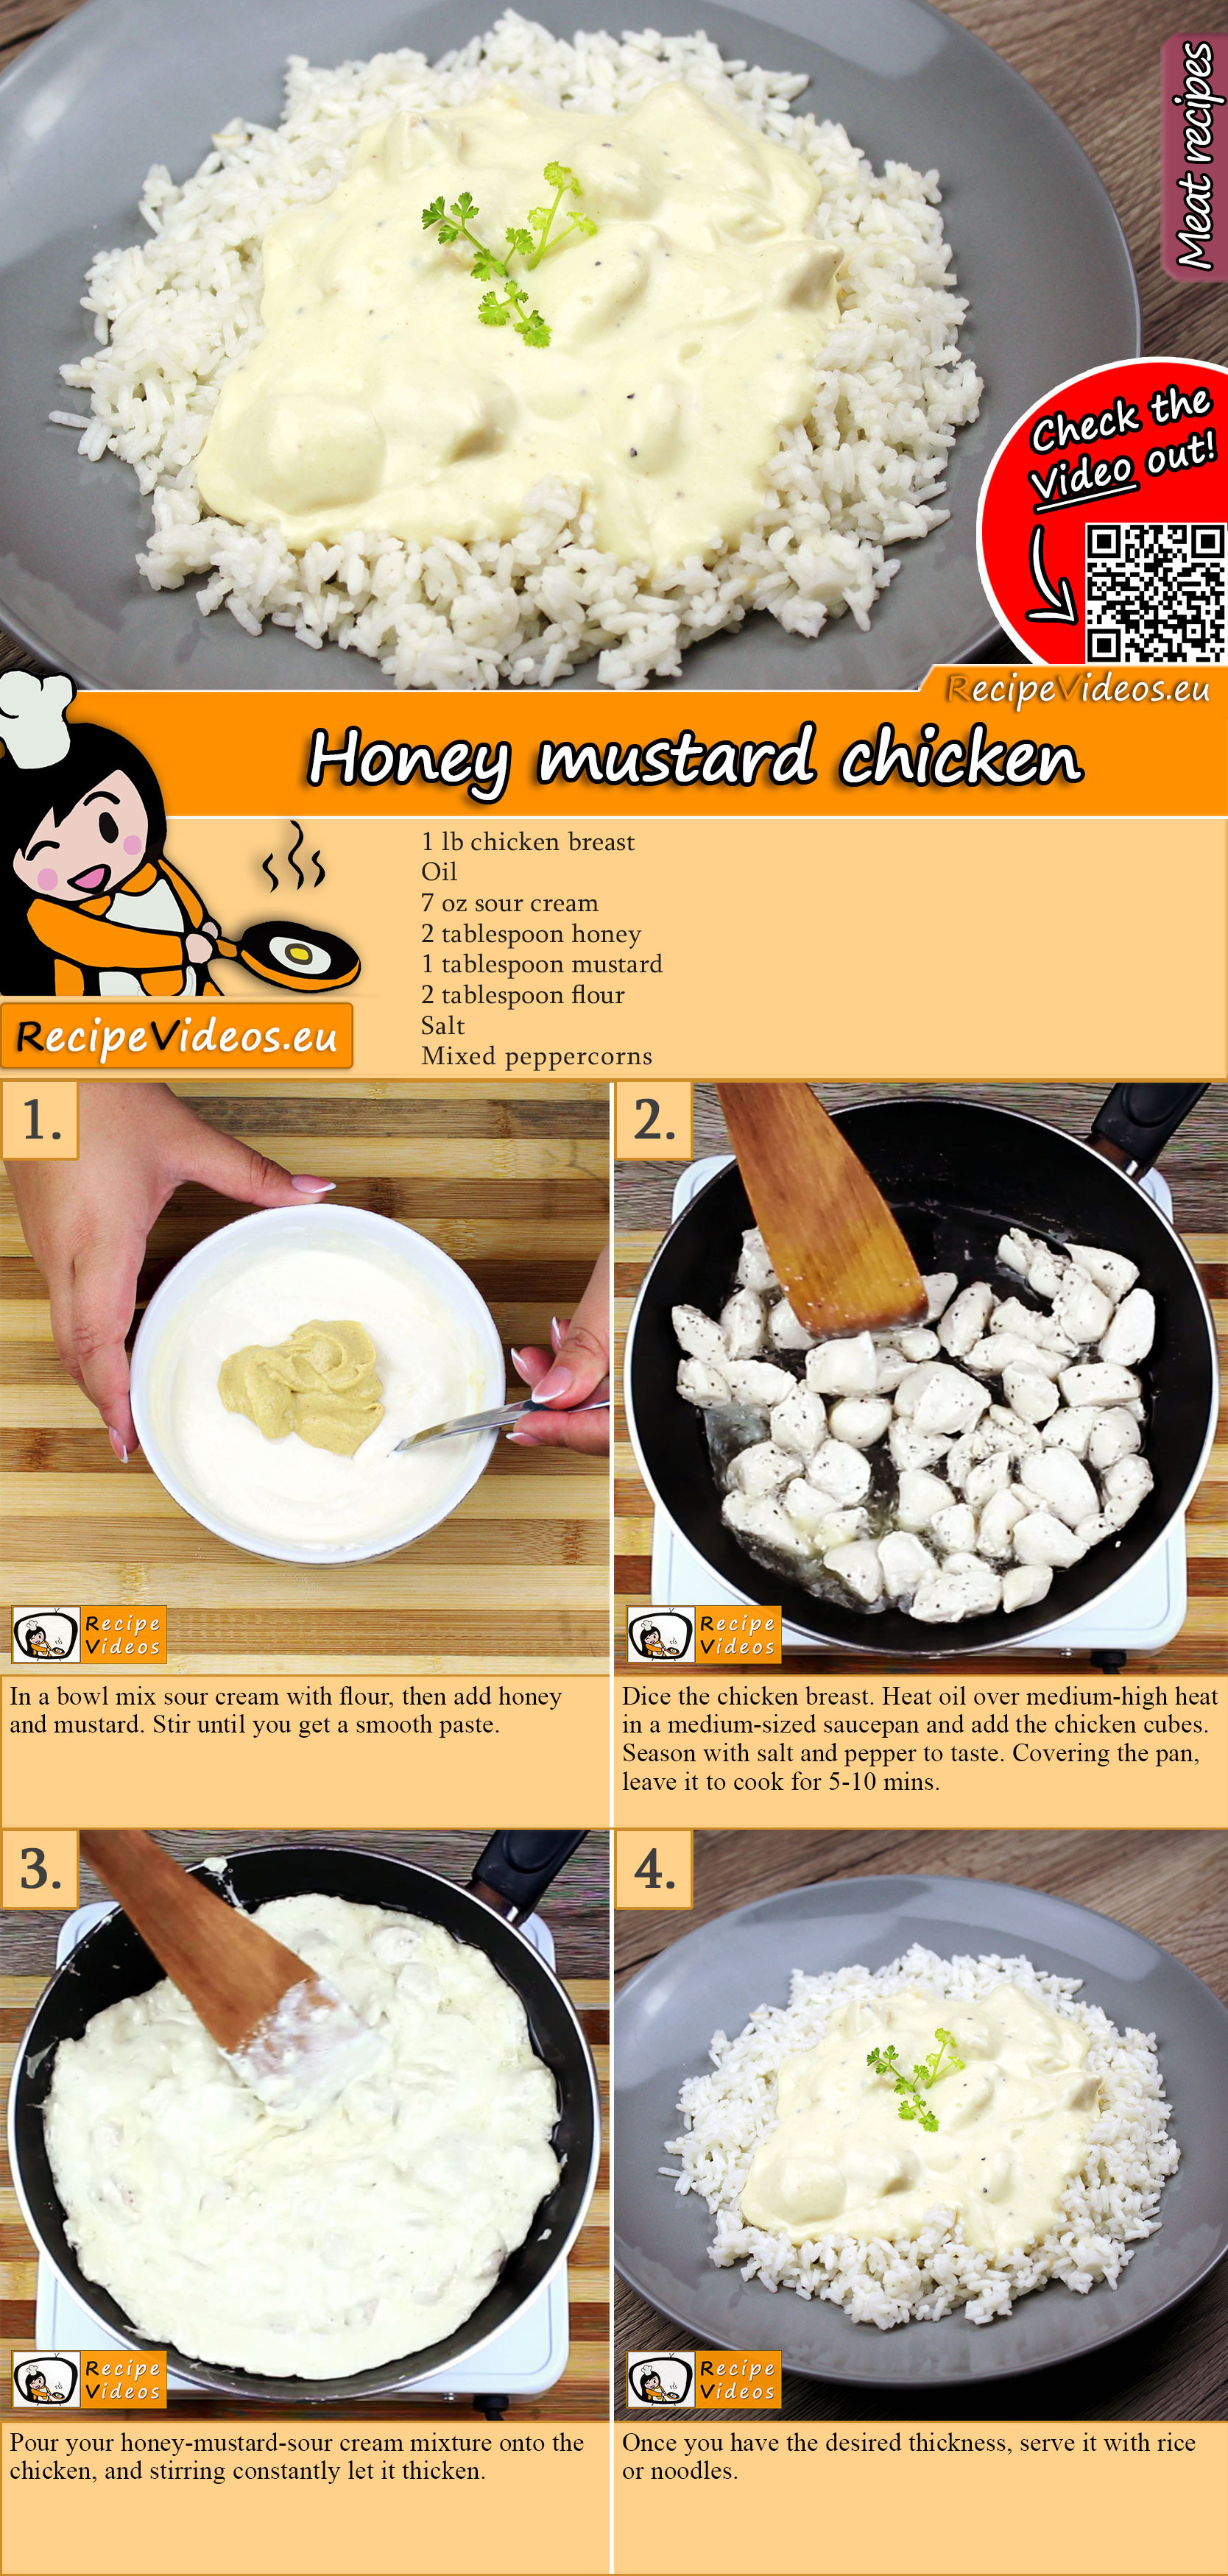 Honey mustard chicken recipe with video